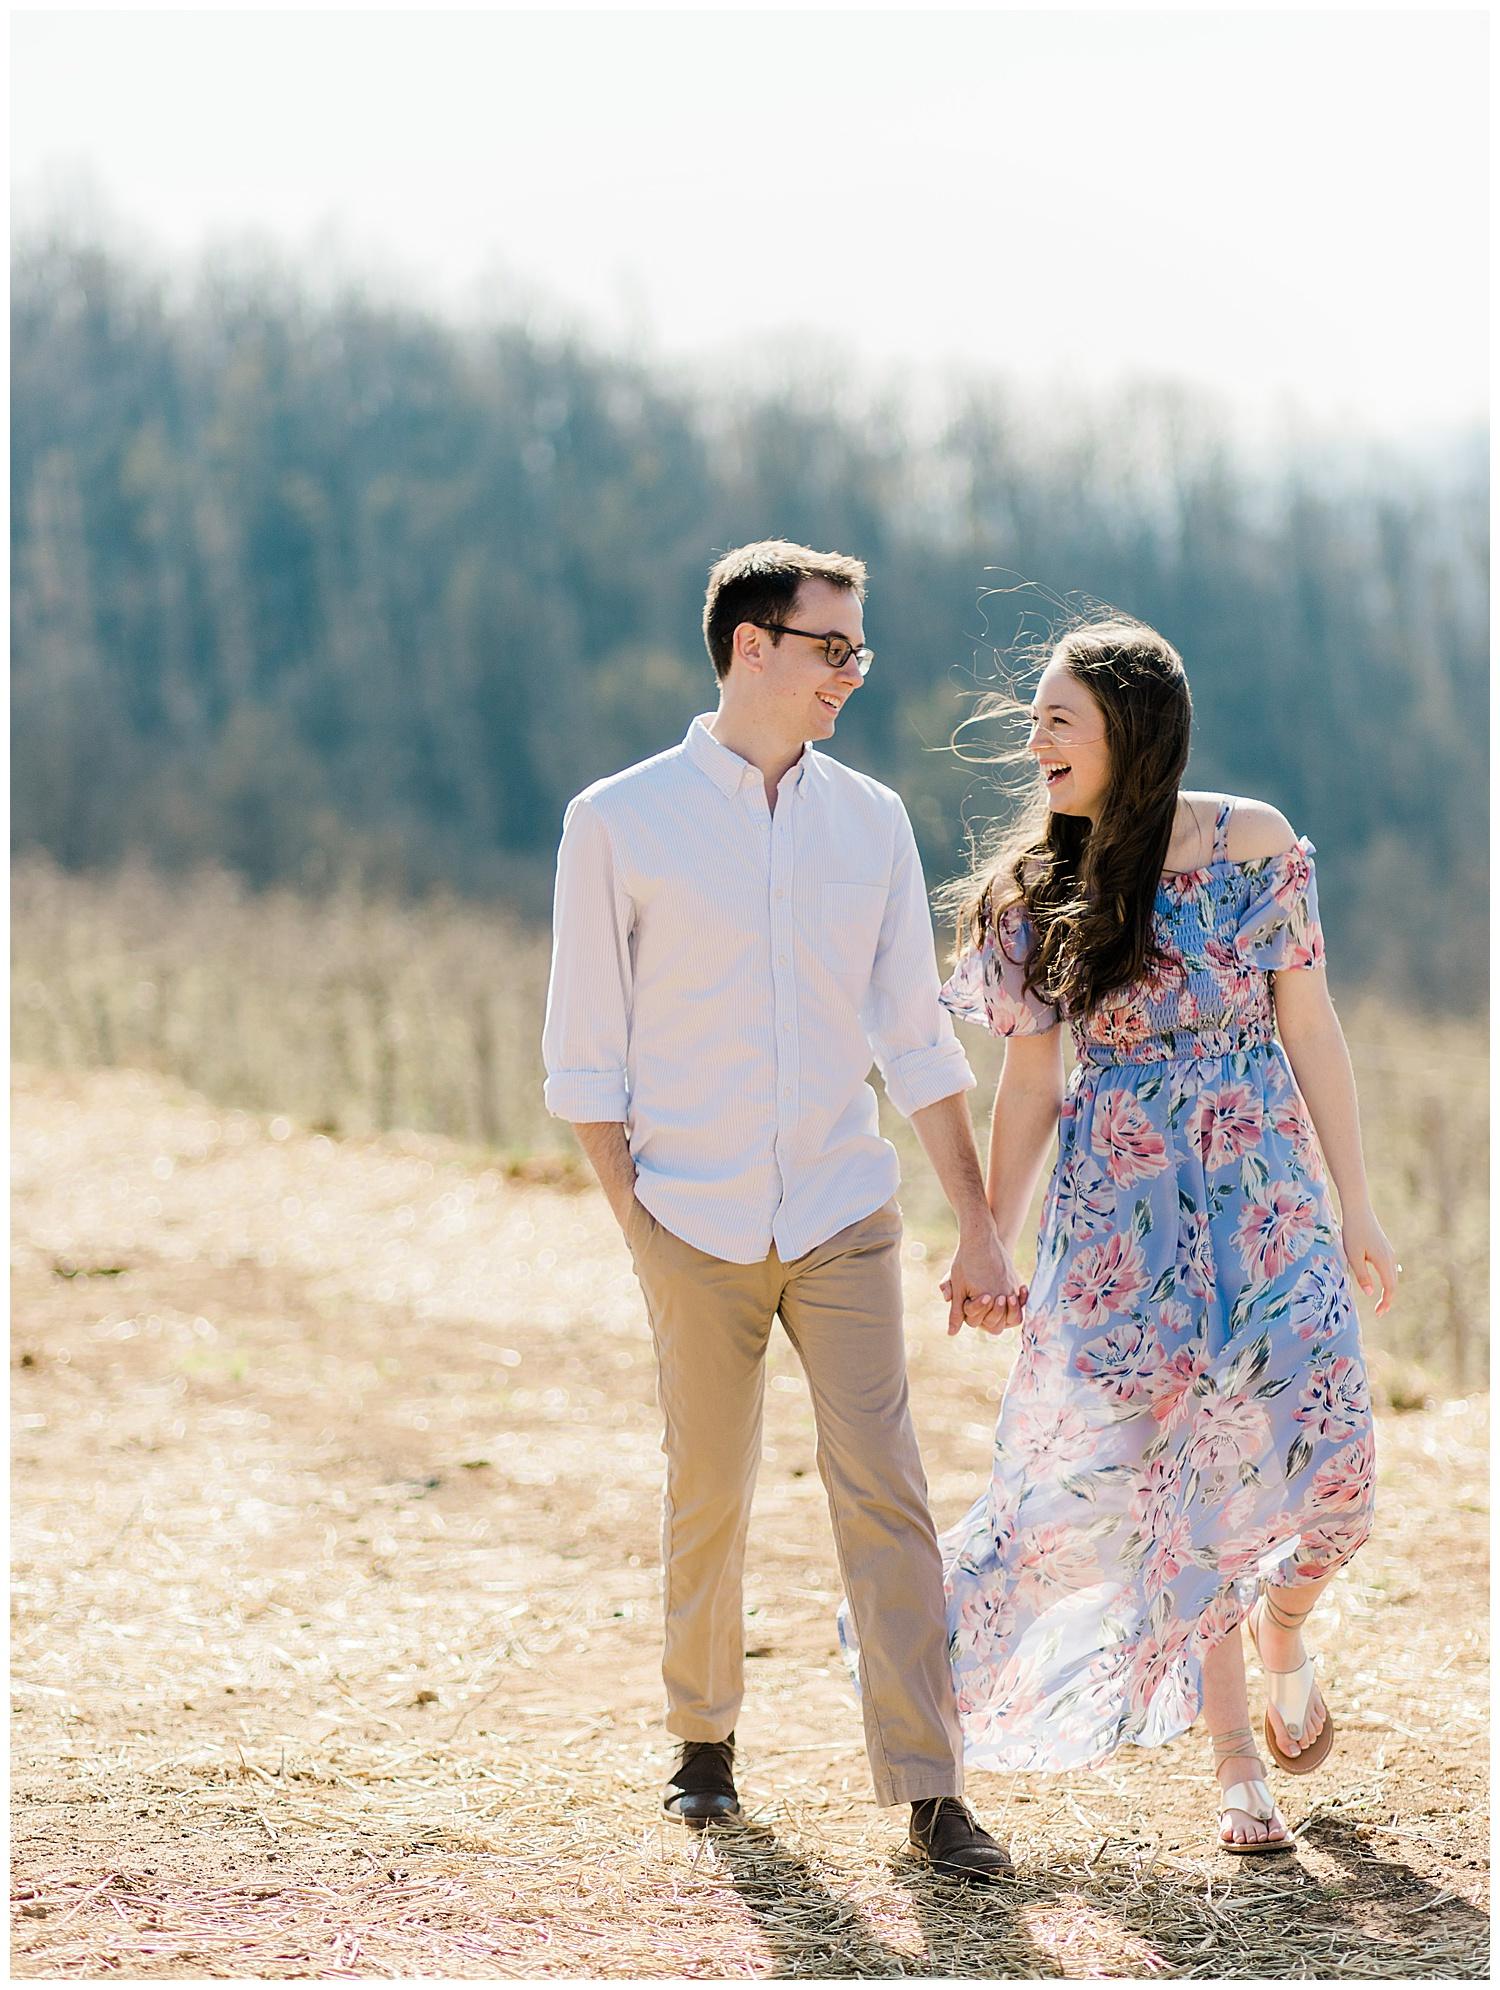 Carter Mountain Engagement Photos | Charlottesville, Virginia